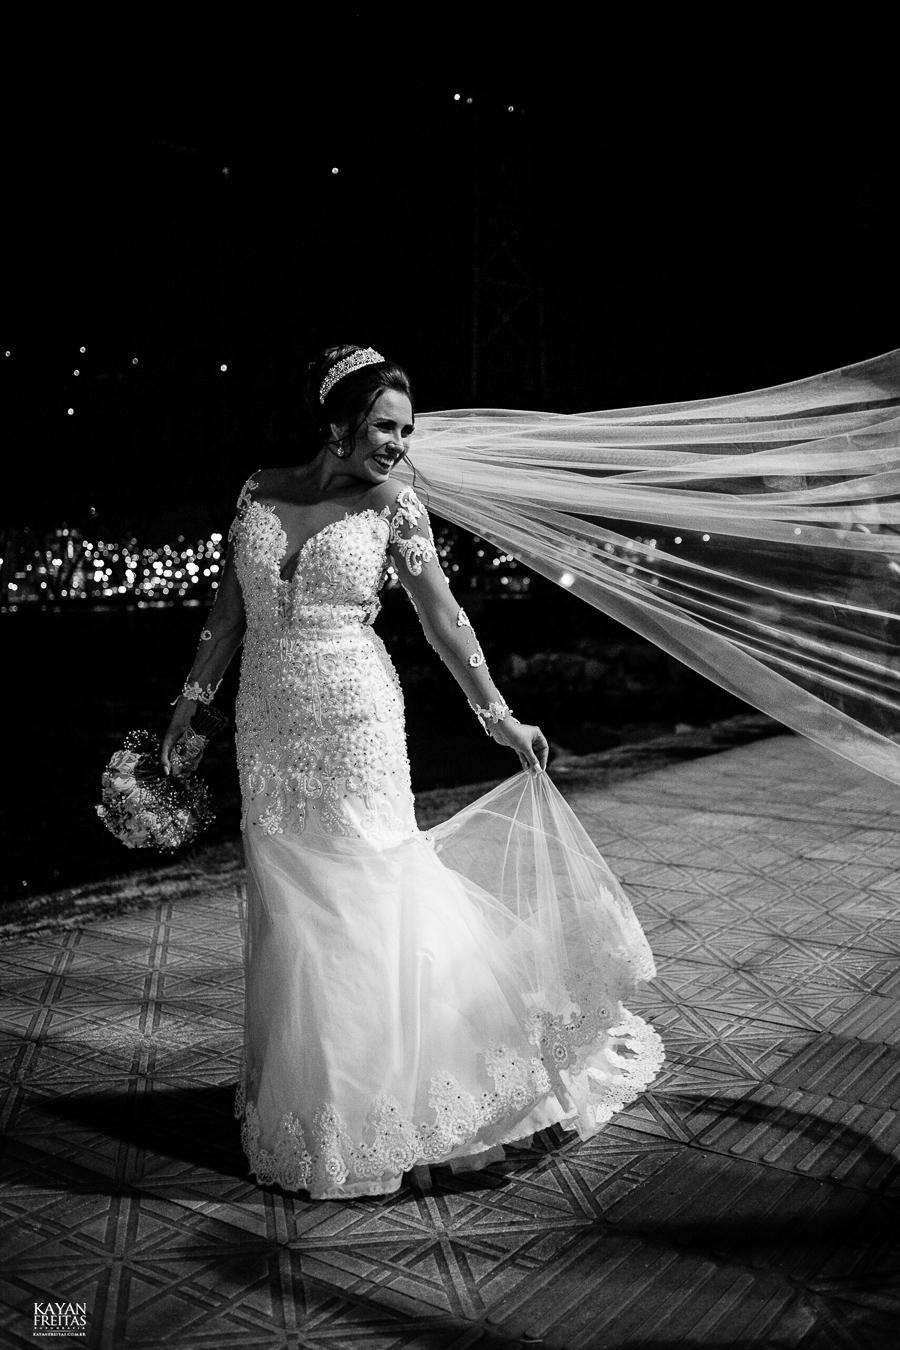 casamento-paularamos-florianopolis-0086 Casamento Cris e Mickael - Paula Ramos Florianópolis